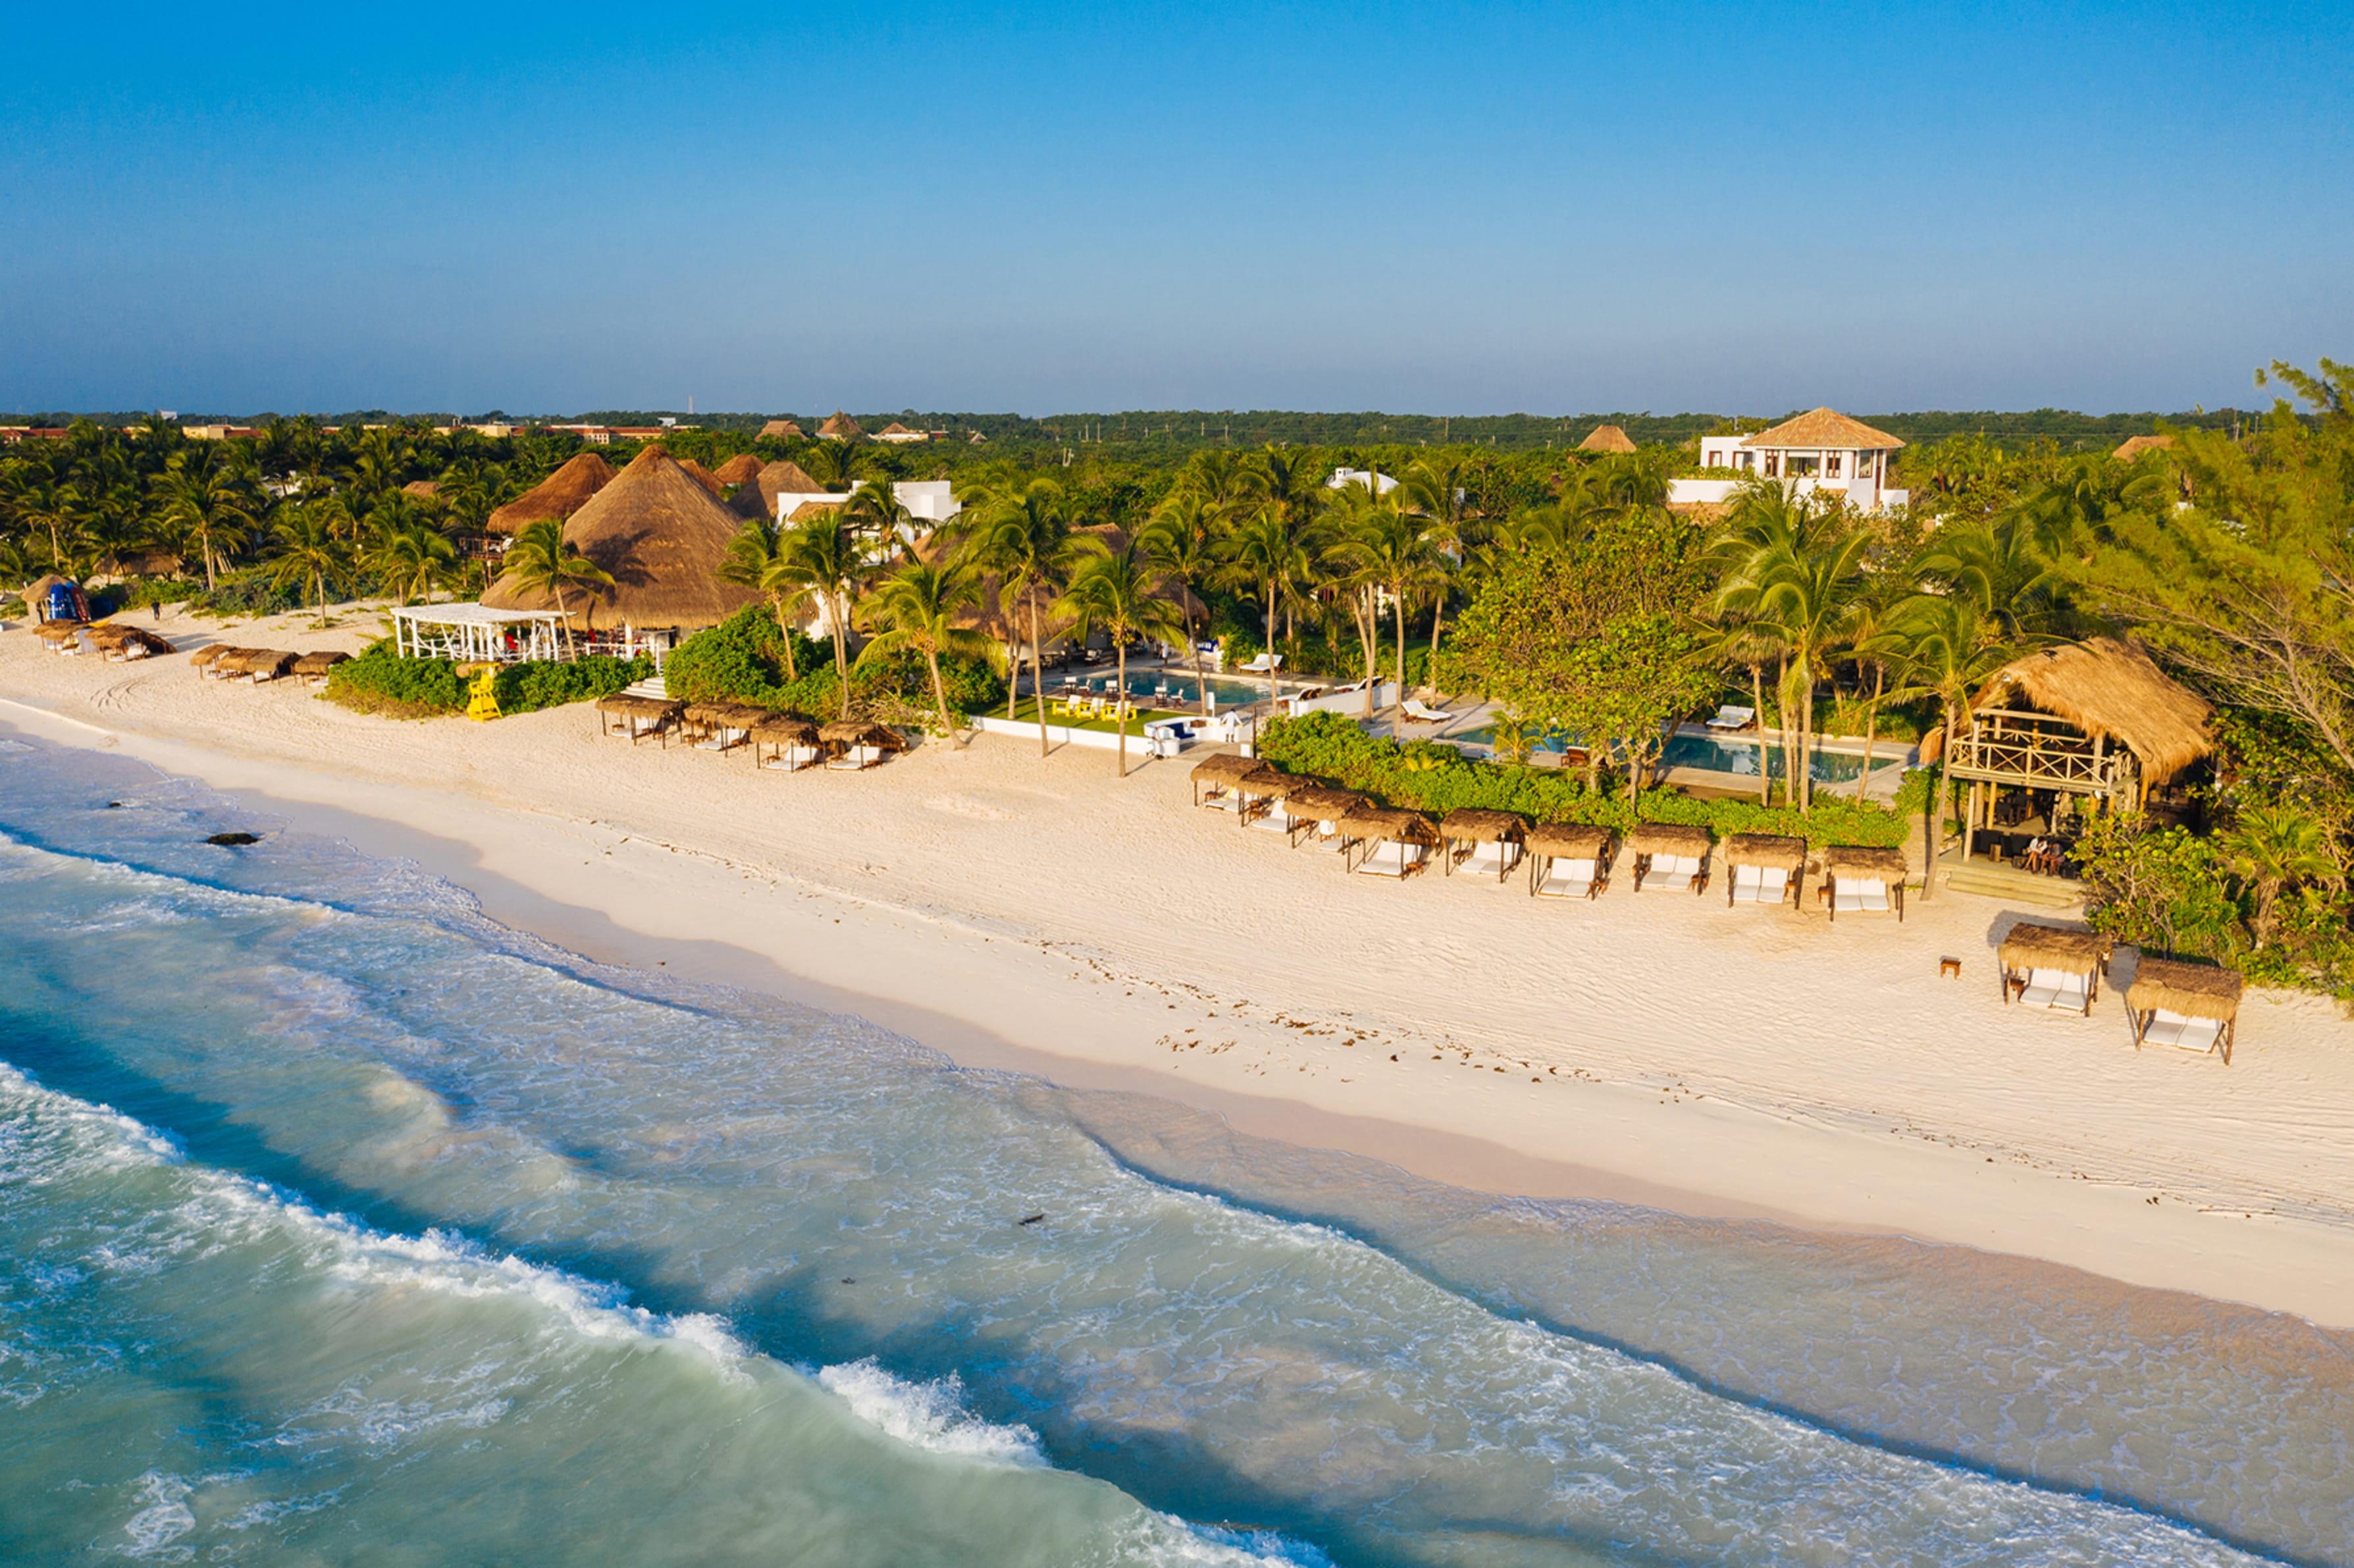 Hotel Esencia, Playa del Carmen, Meksyk